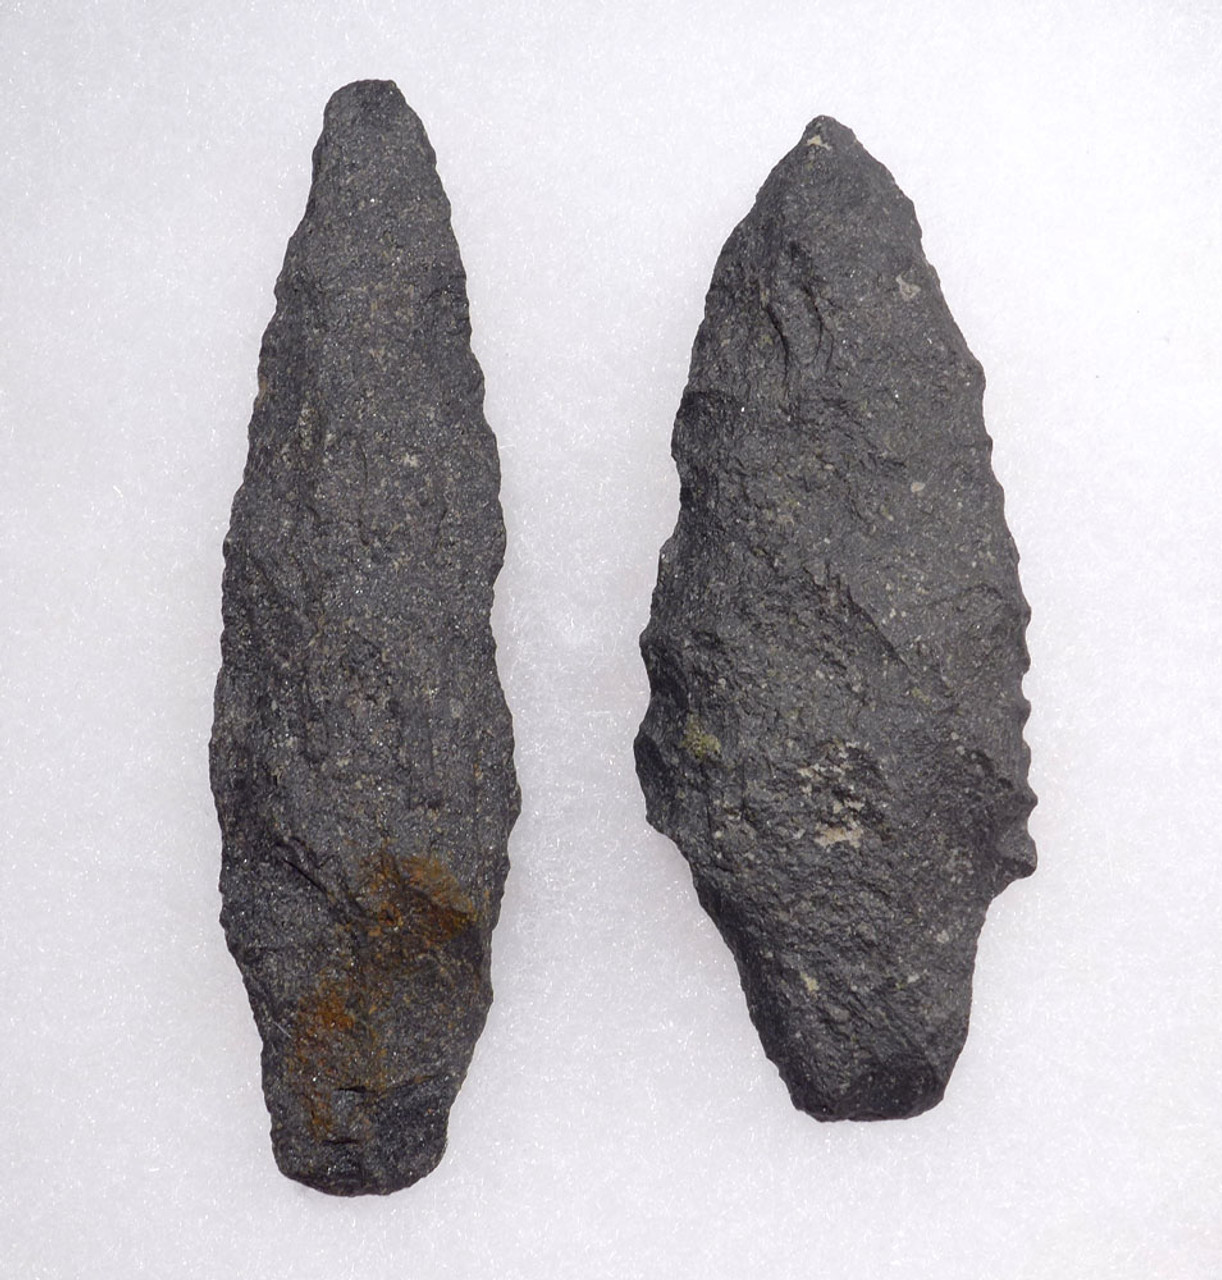 TWO RARE BASALT ATLATL PRE-COLUMBIAN SPEARHEADS  *PC322